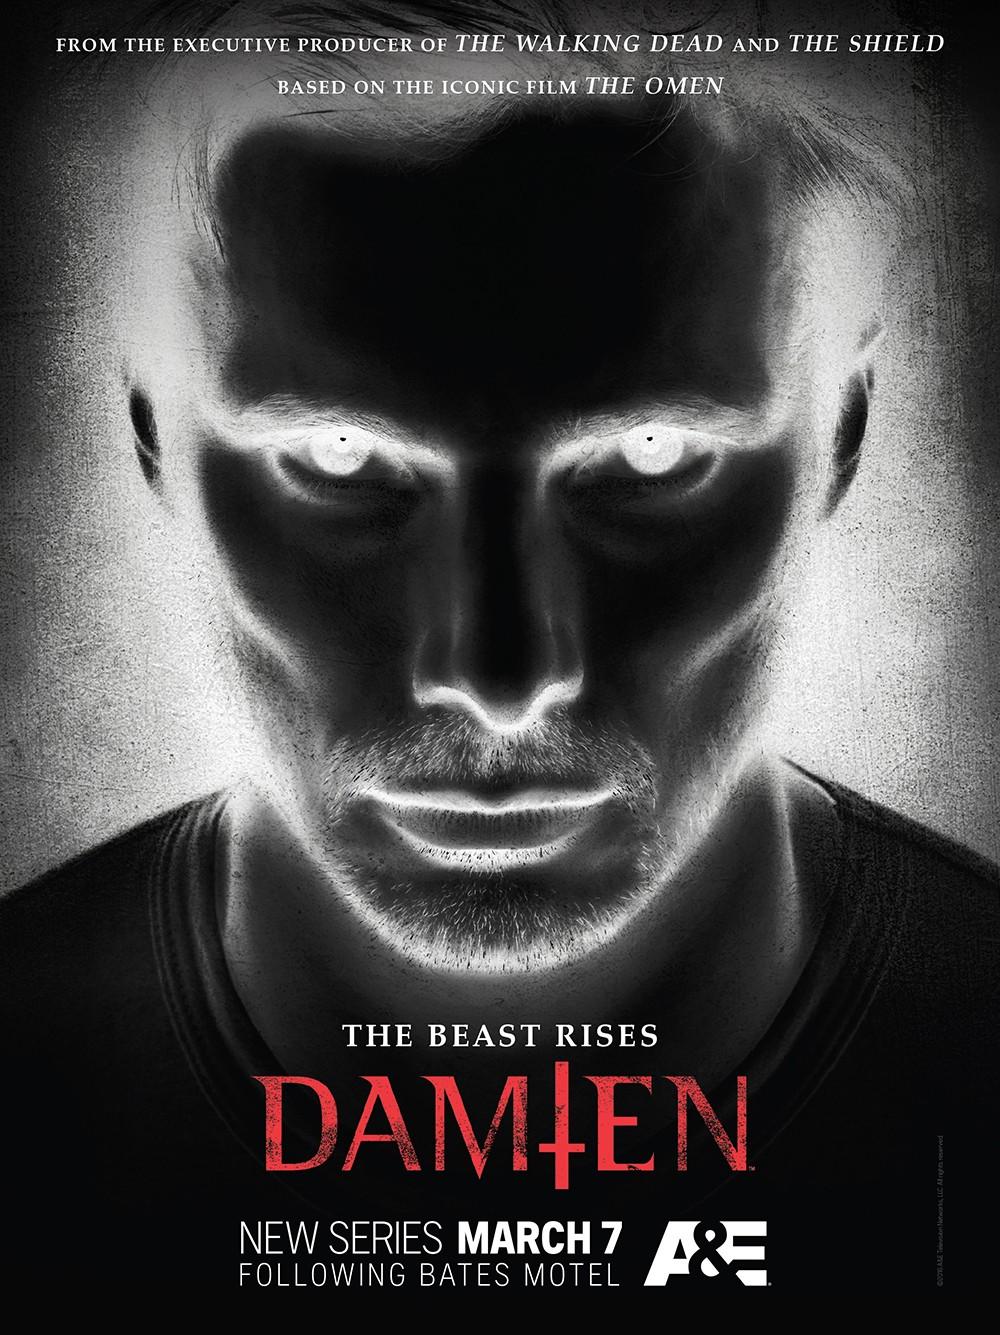 First Key Visual Art For A&E's Horror-Drama Damien Unveiled | horror-drama